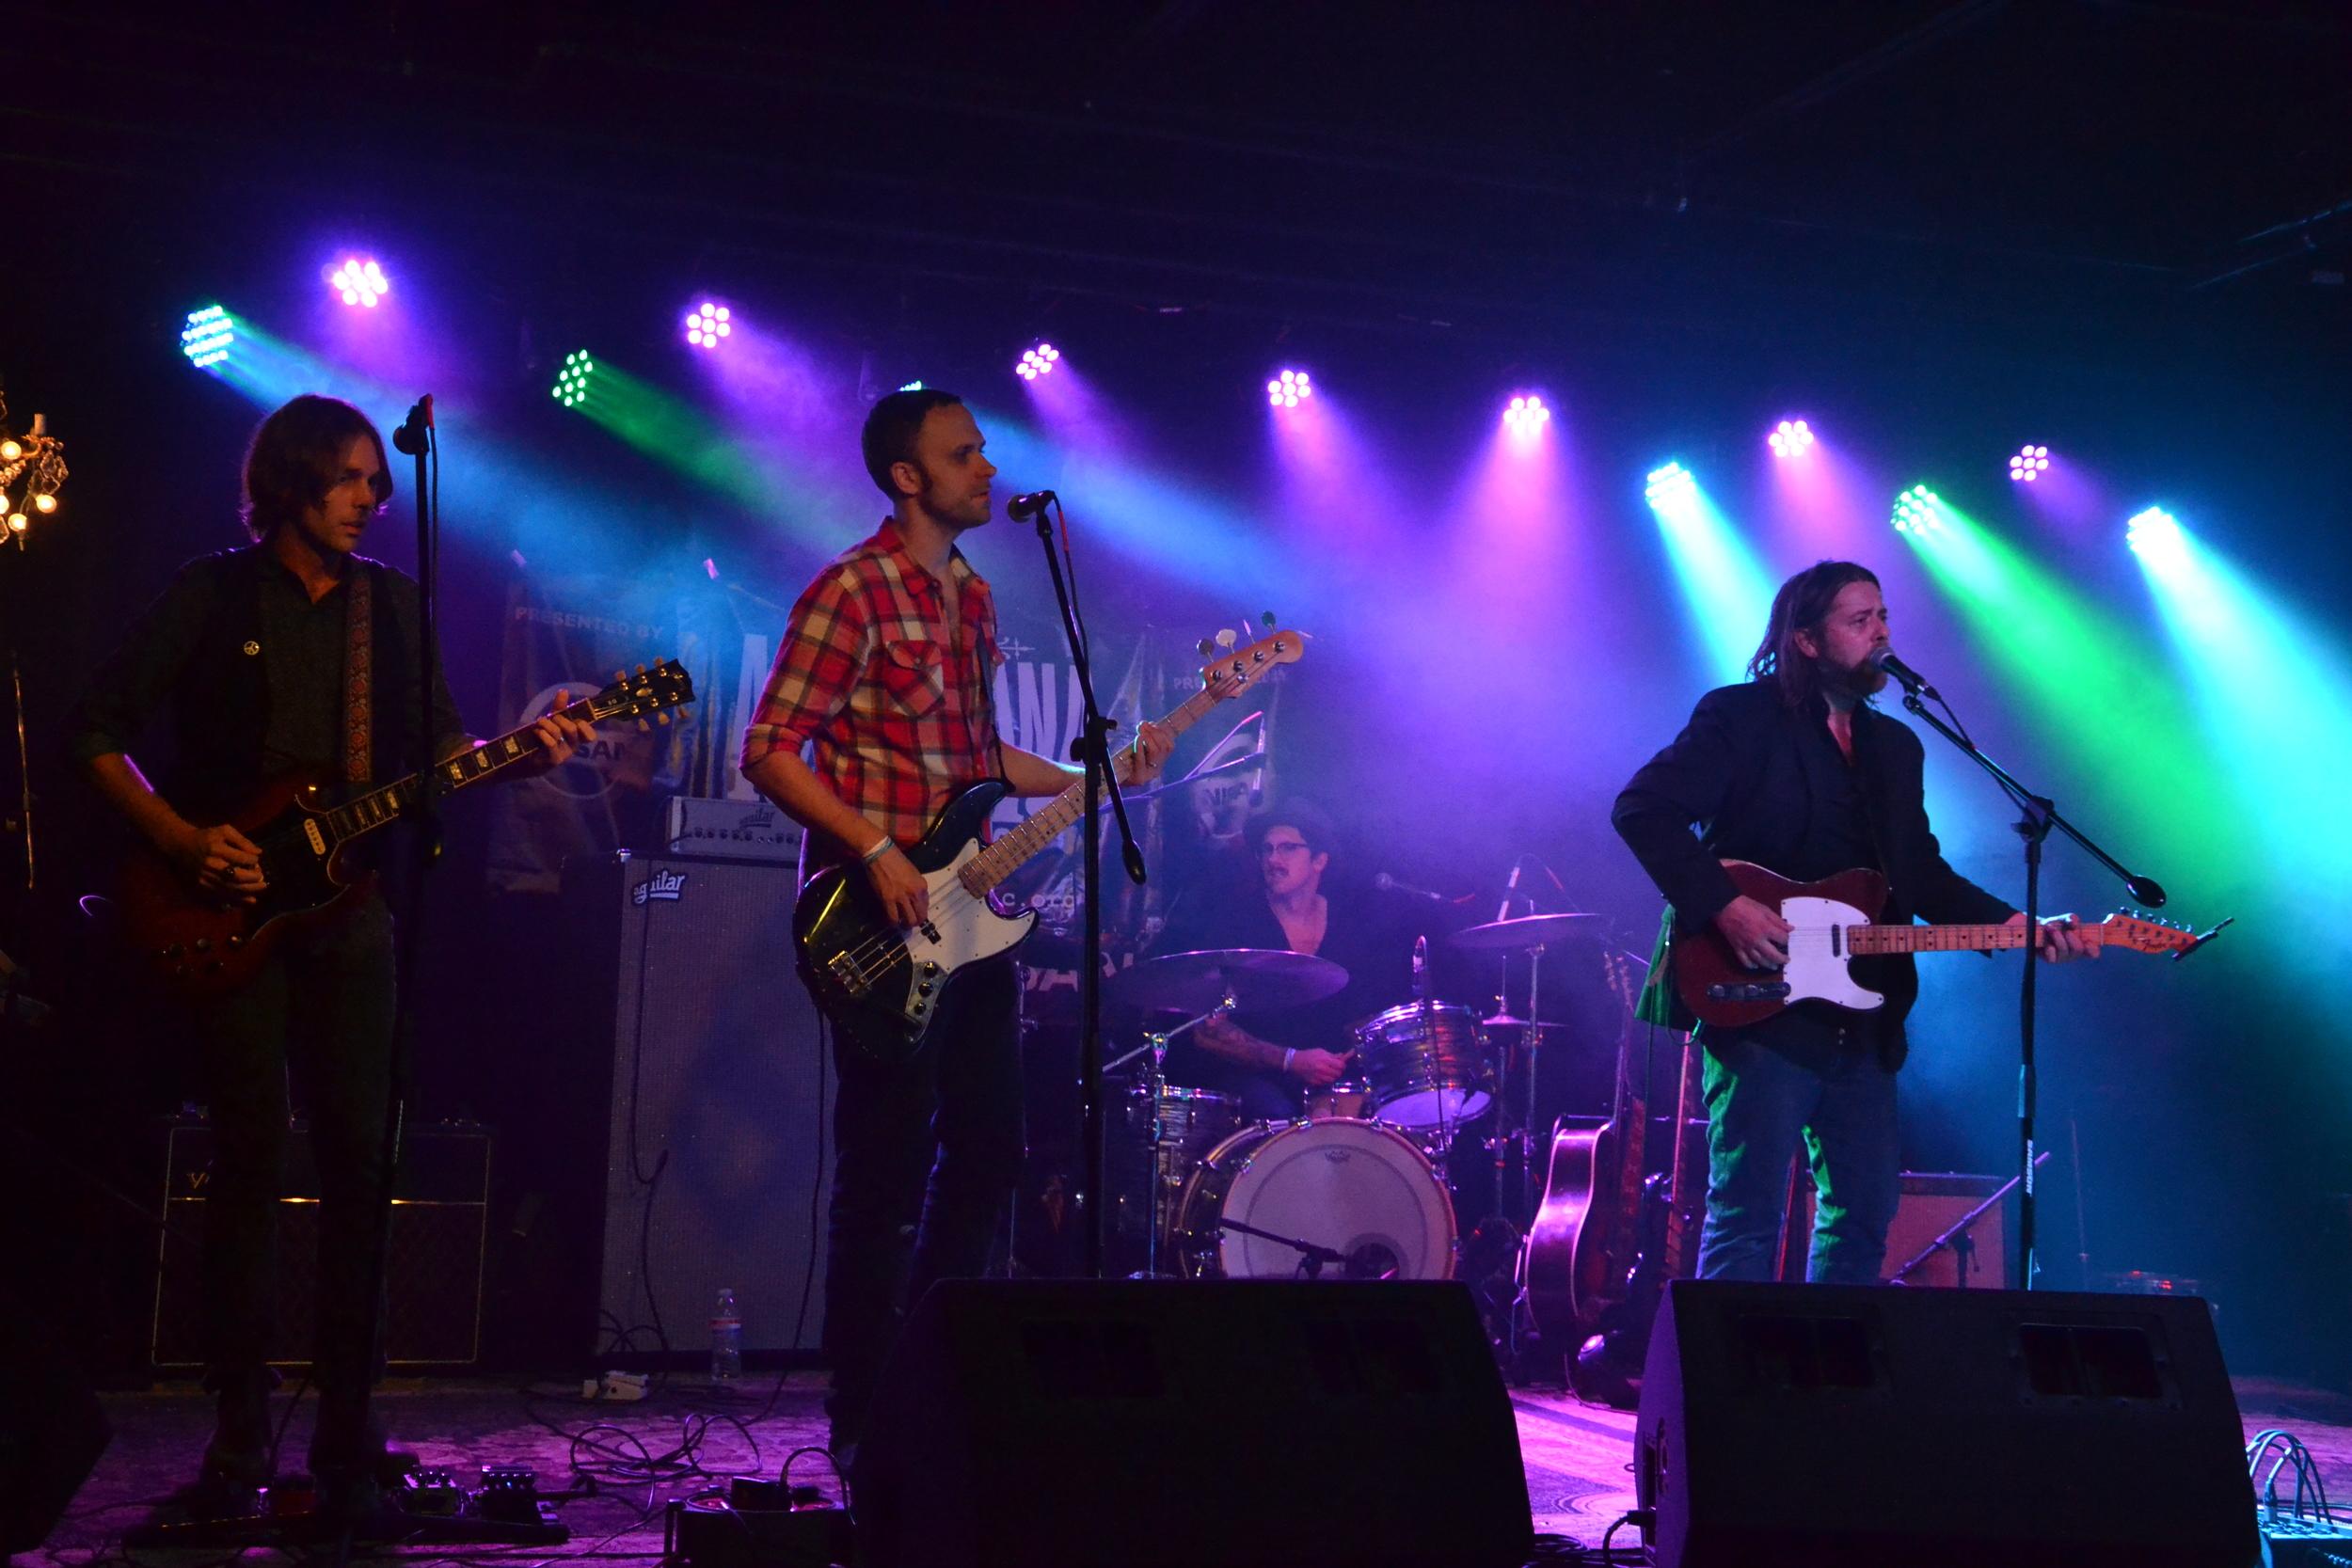 Photo Credit: Paul Felton  Jerry Roe on bass. Sadler Vaden on guitar.